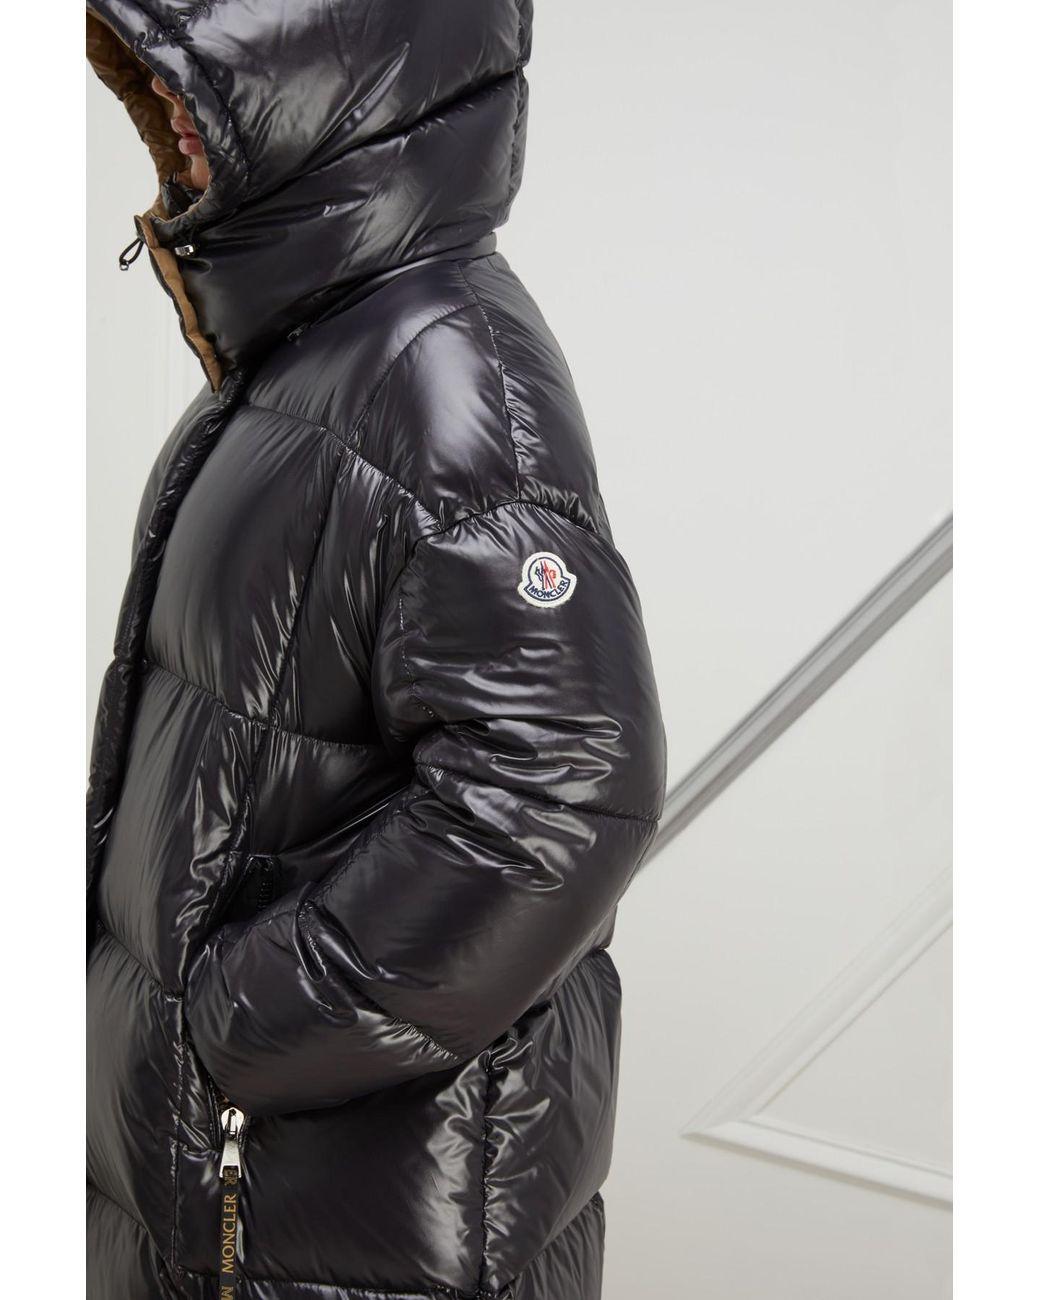 Moncler Black Parnaiba Long Down Jacket Moncler Jacket Women Down Jacket Jackets [ 1300 x 1040 Pixel ]